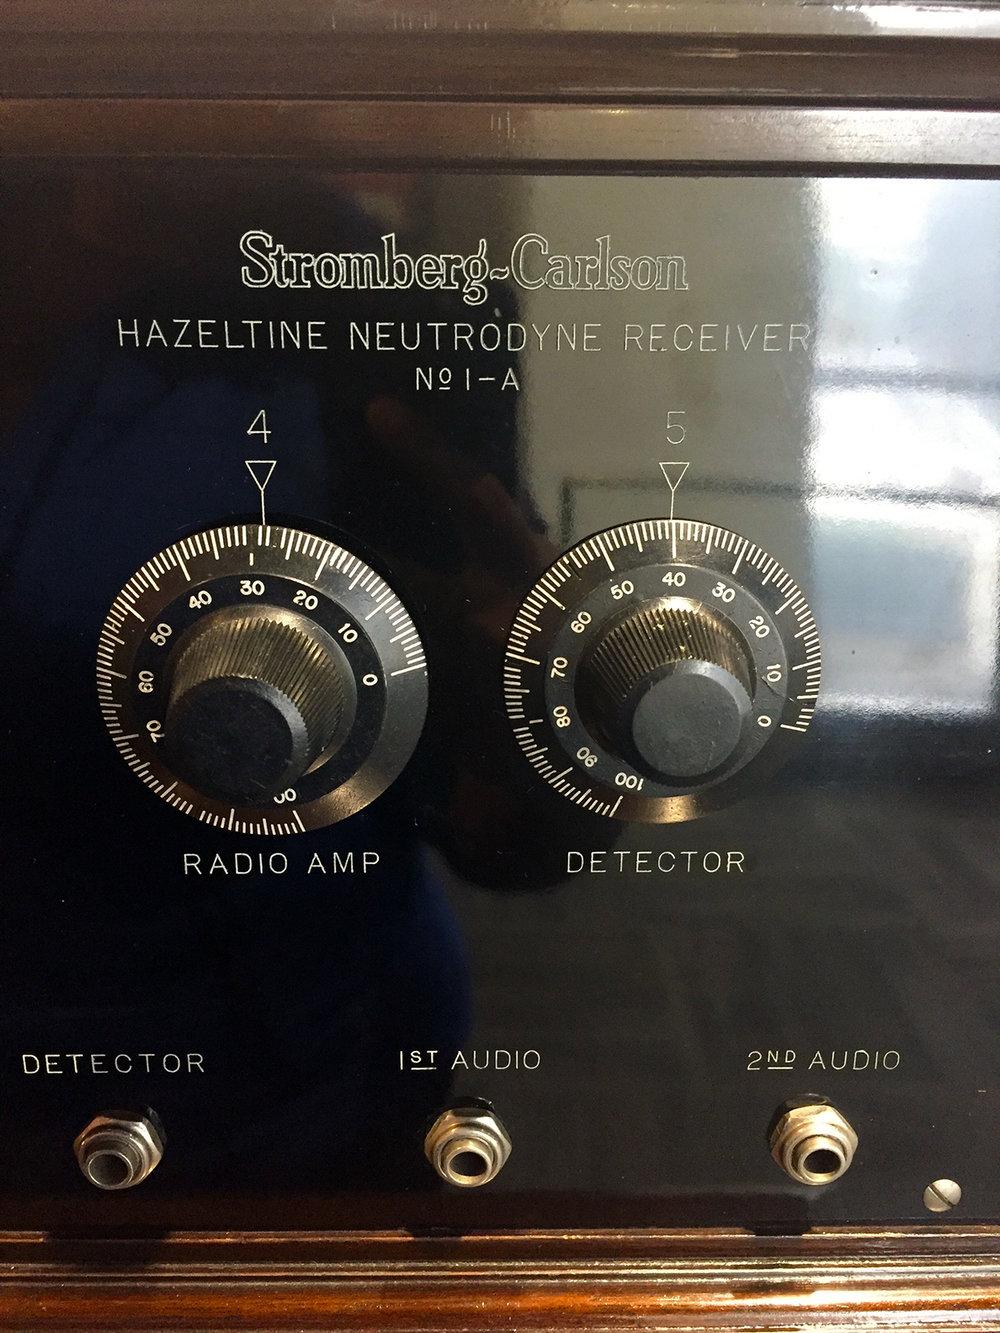 Stromberg-Carlson Hazeltine Neutrodyne Receiver Dial